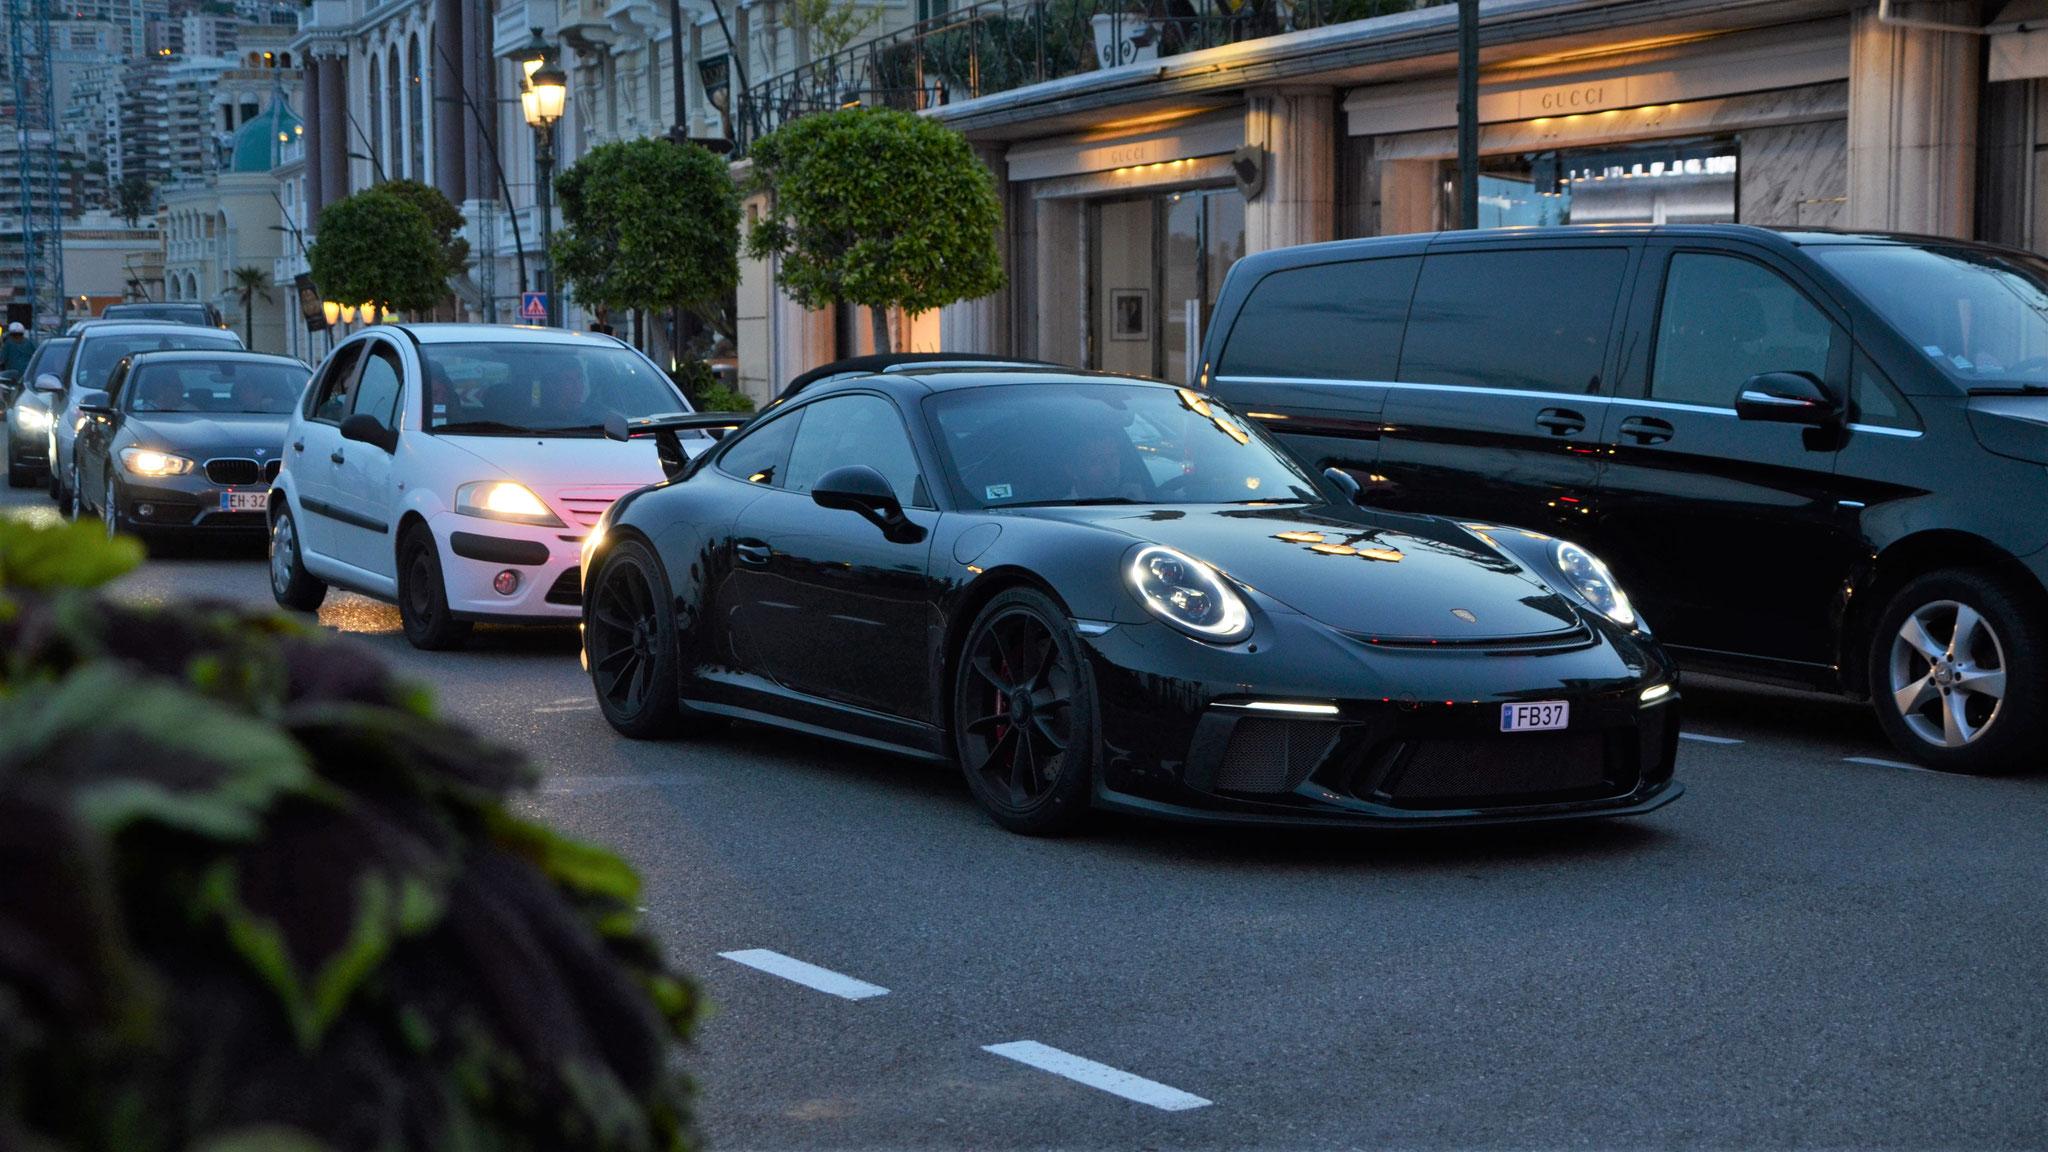 Porsche 991 GT3 - FB37 (LV)